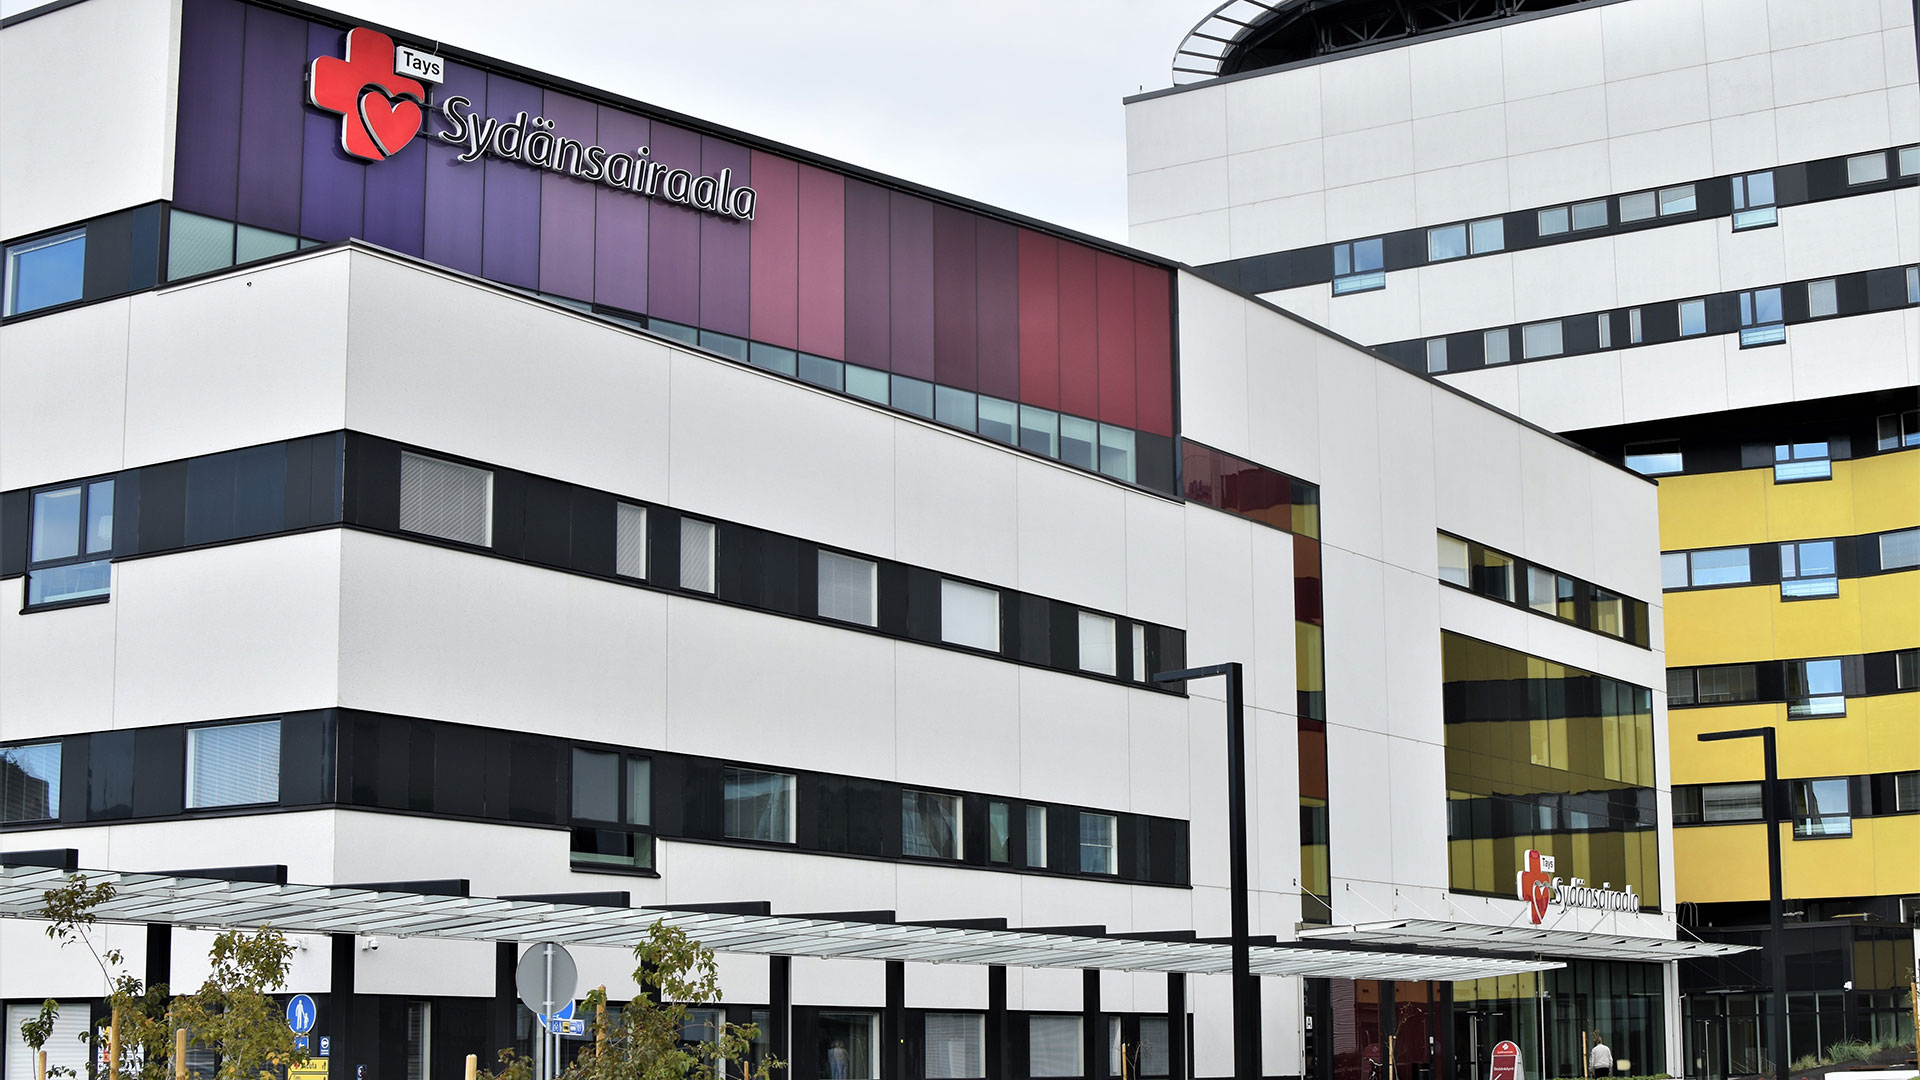 N-rakennus, Sydänsairaala, TAYS Uudistamisohjelma 2020, N-rakennus, Tampere